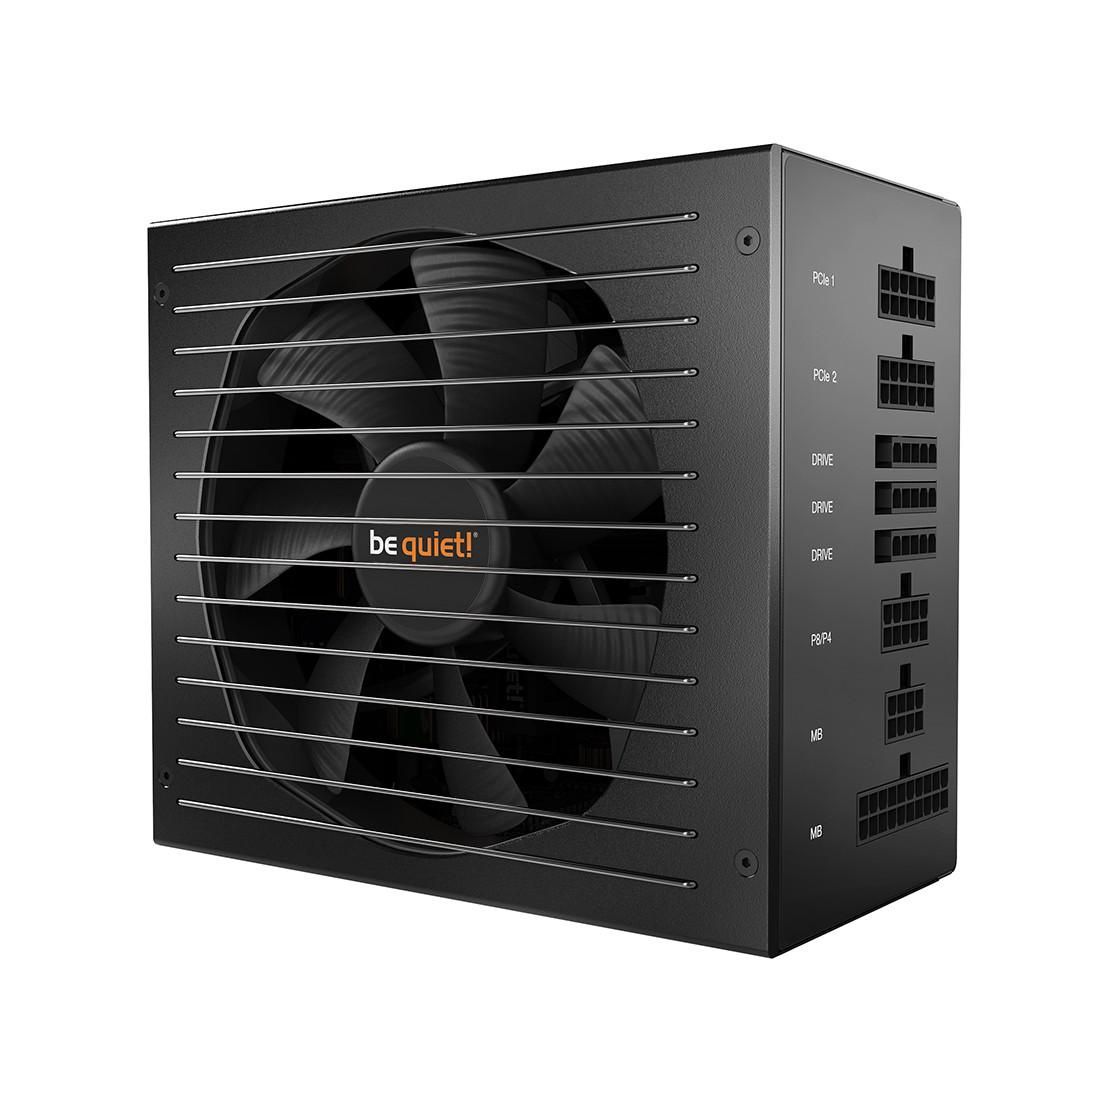 Блок питания, Bequiet!, Straight Power 11 550W, BN281, 550W, 80 PLUS Gold